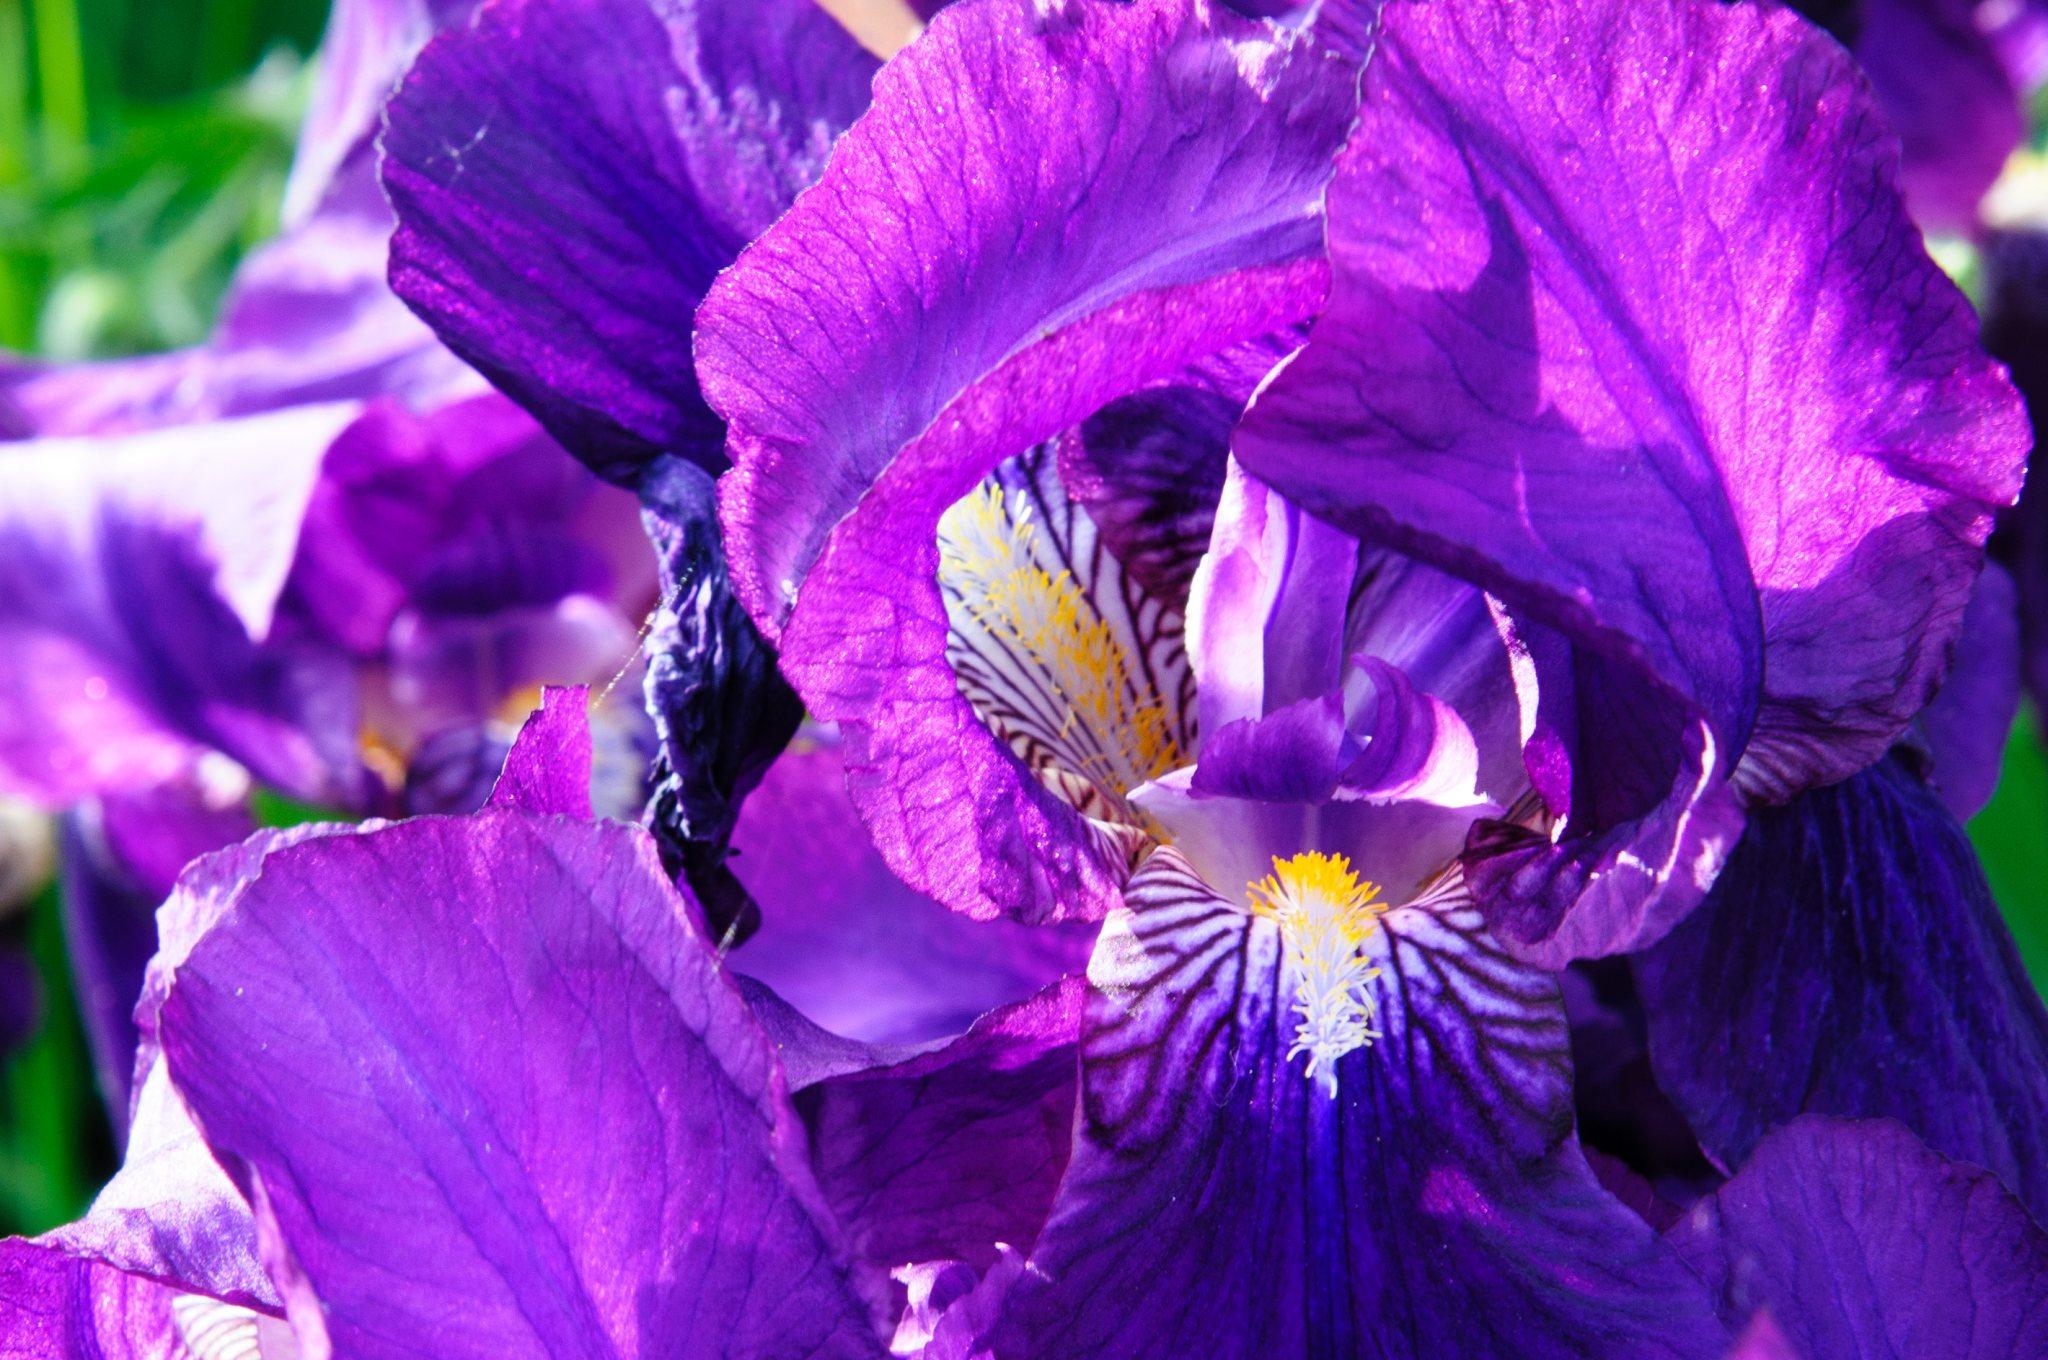 bronces_fleurs-13.jpg